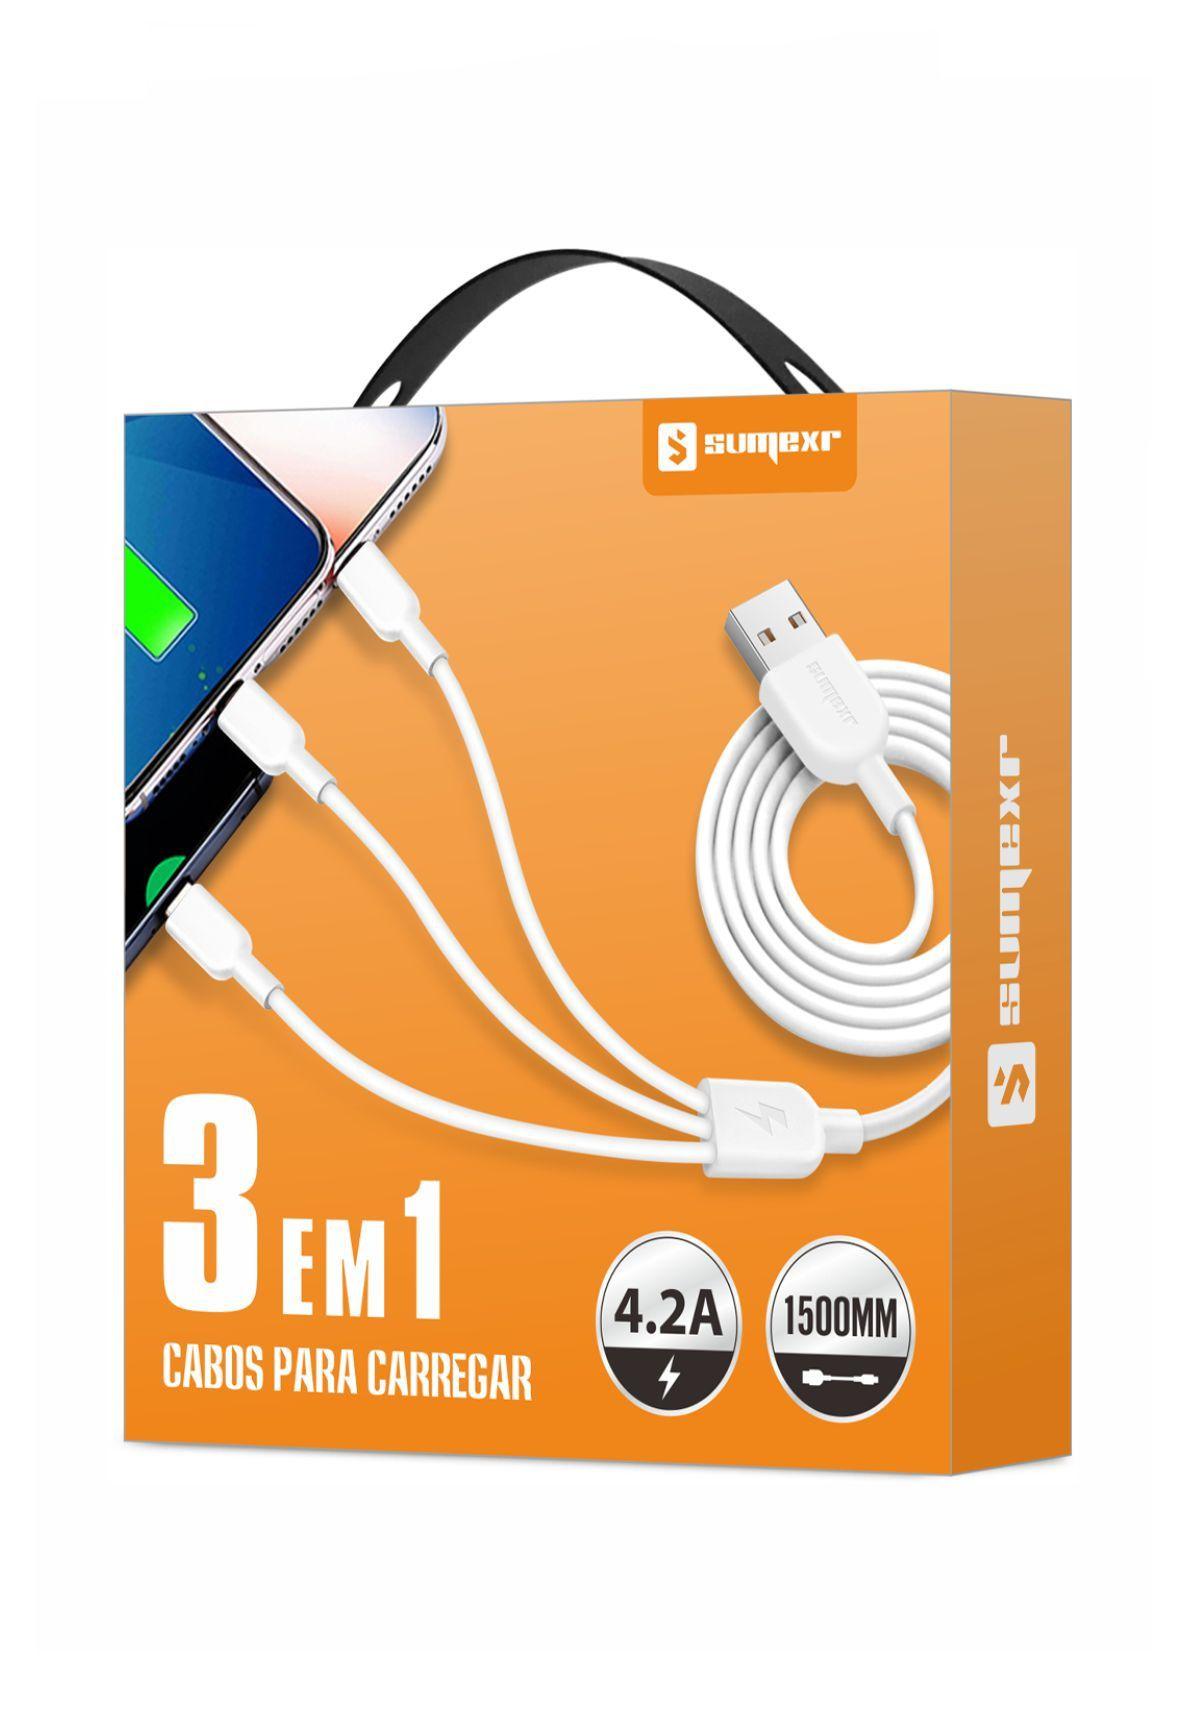 Cabo Carregador 3x1 Usb Micro Tipo C iPhone Android Qualidade Universal 4.2A Favix  - HARDFAST INFORMÁTICA